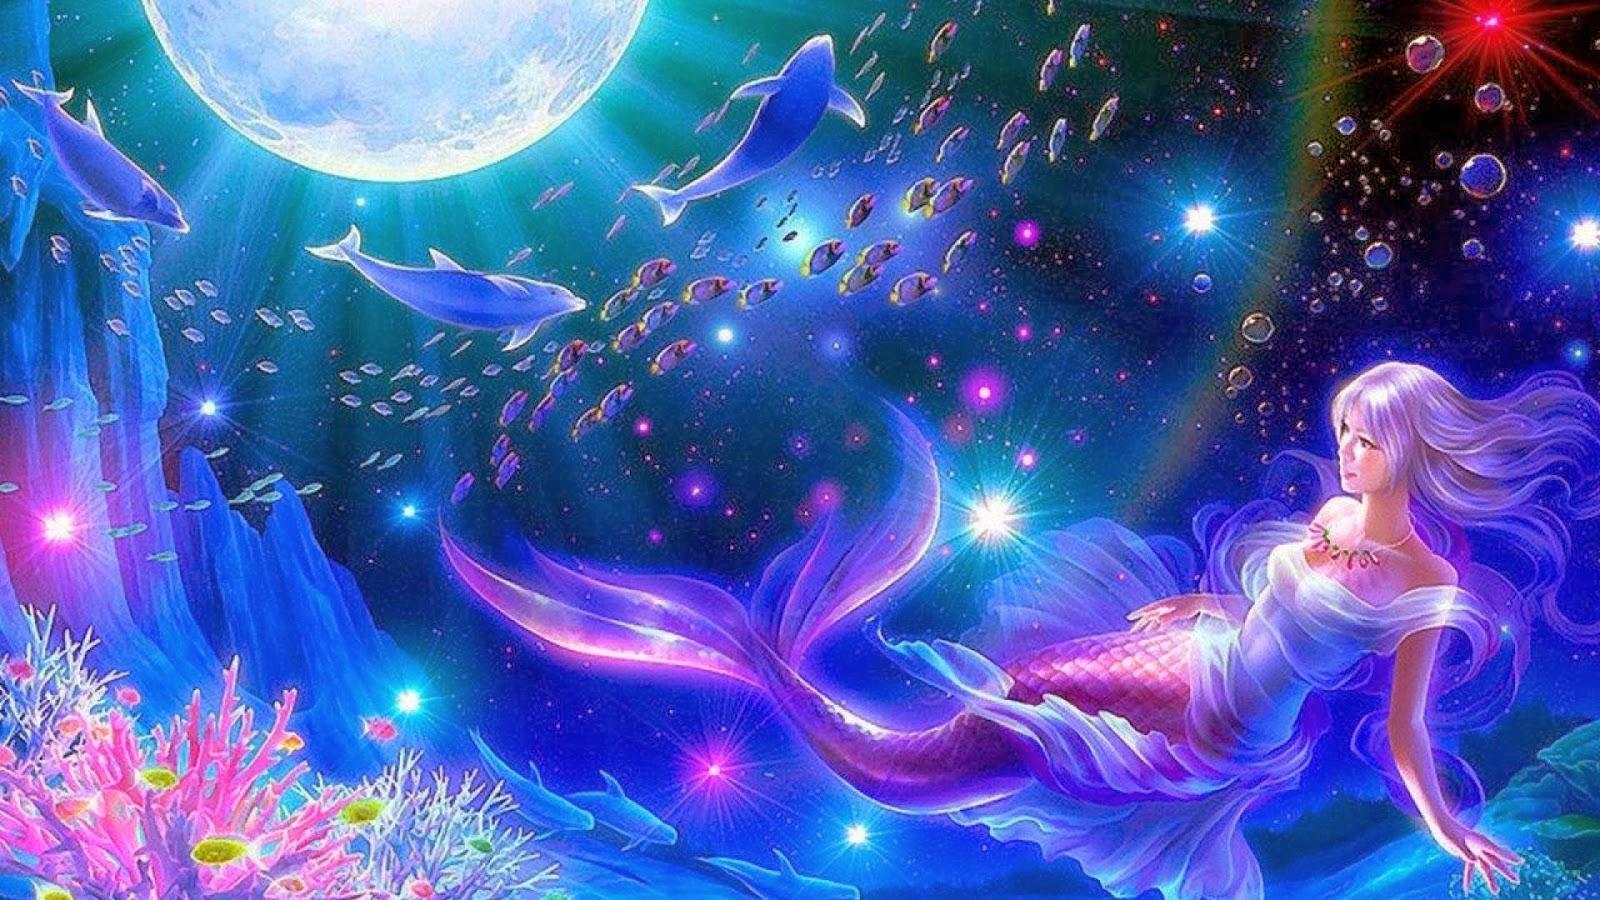 All new wallpaper : Mermaid moon fantasy widescreen hd ...